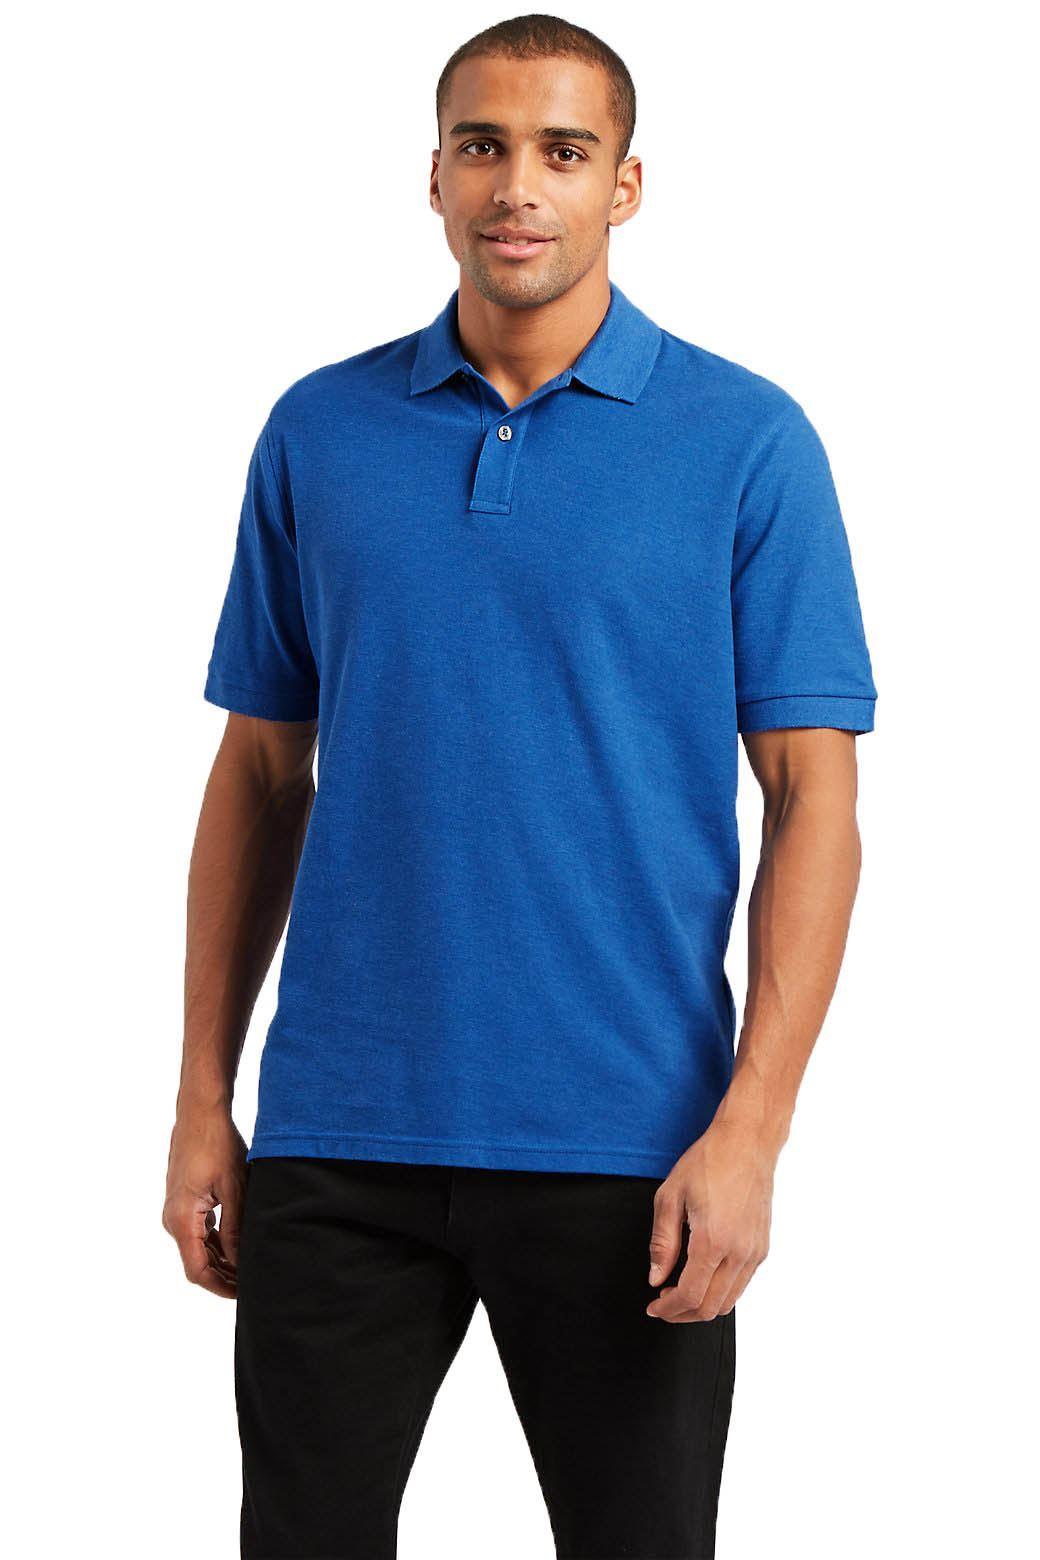 Marks-amp-Spencer-Camisa-Polo-Pique-Algodon-Para-Hombres-Tallas-Extra-Grande miniatura 9